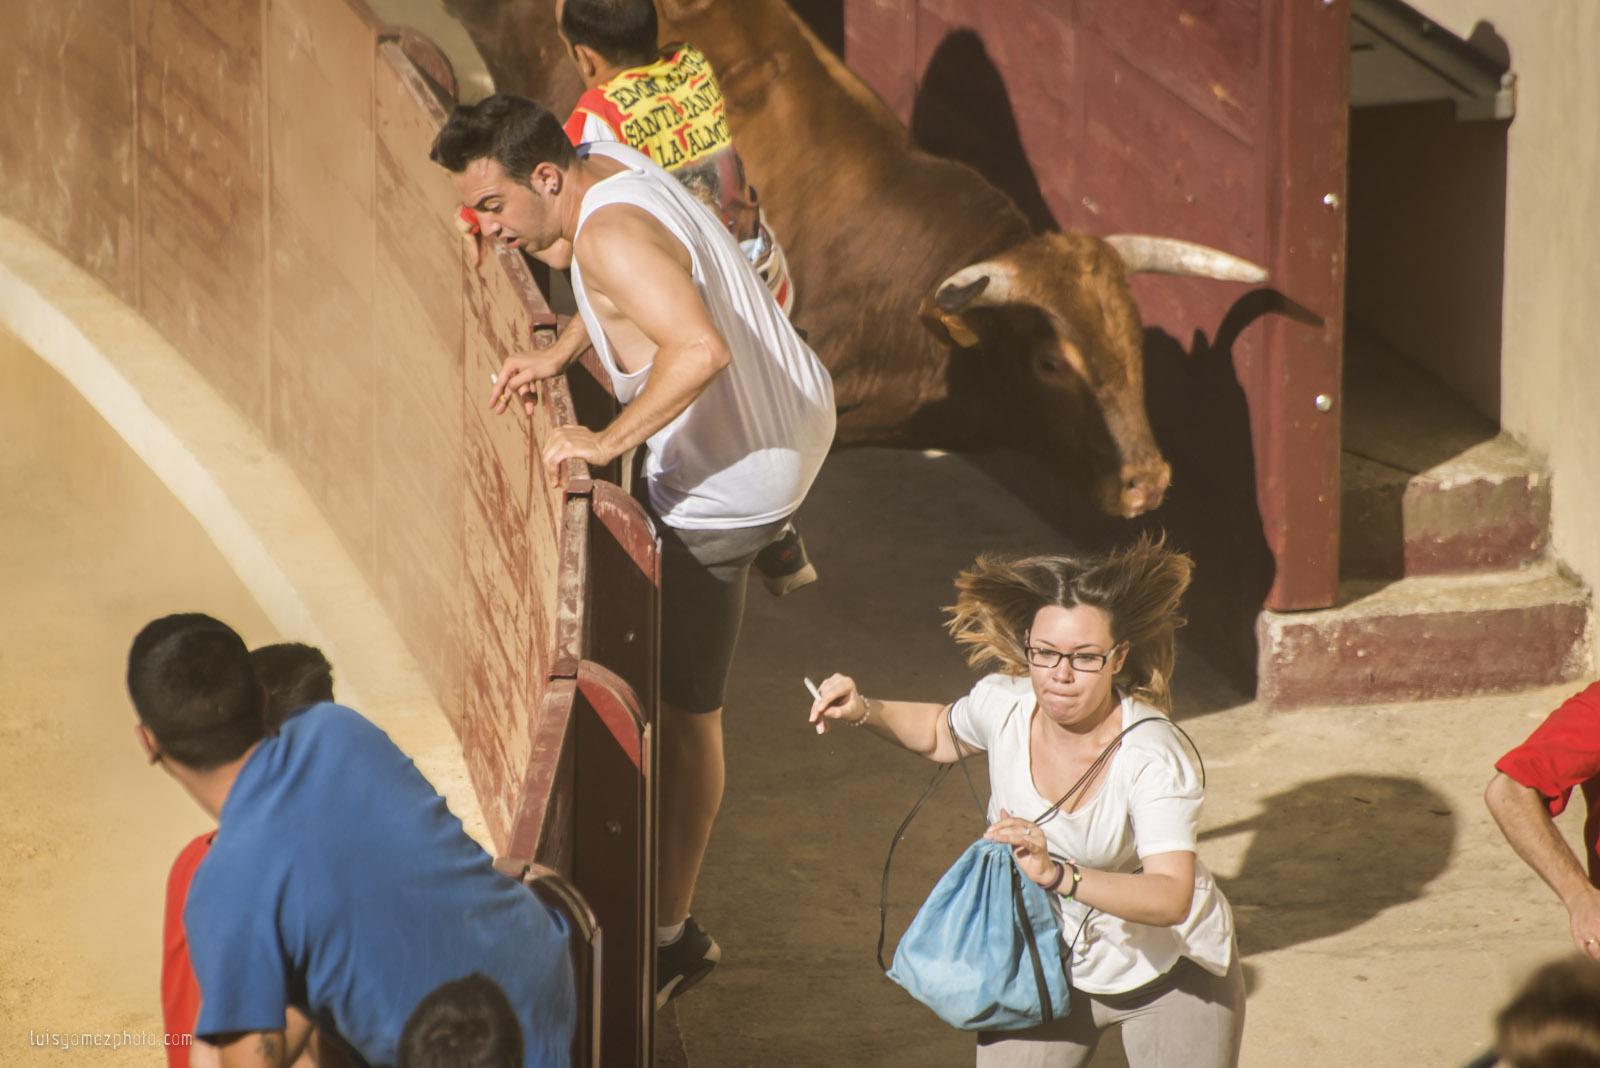 When bull jumps